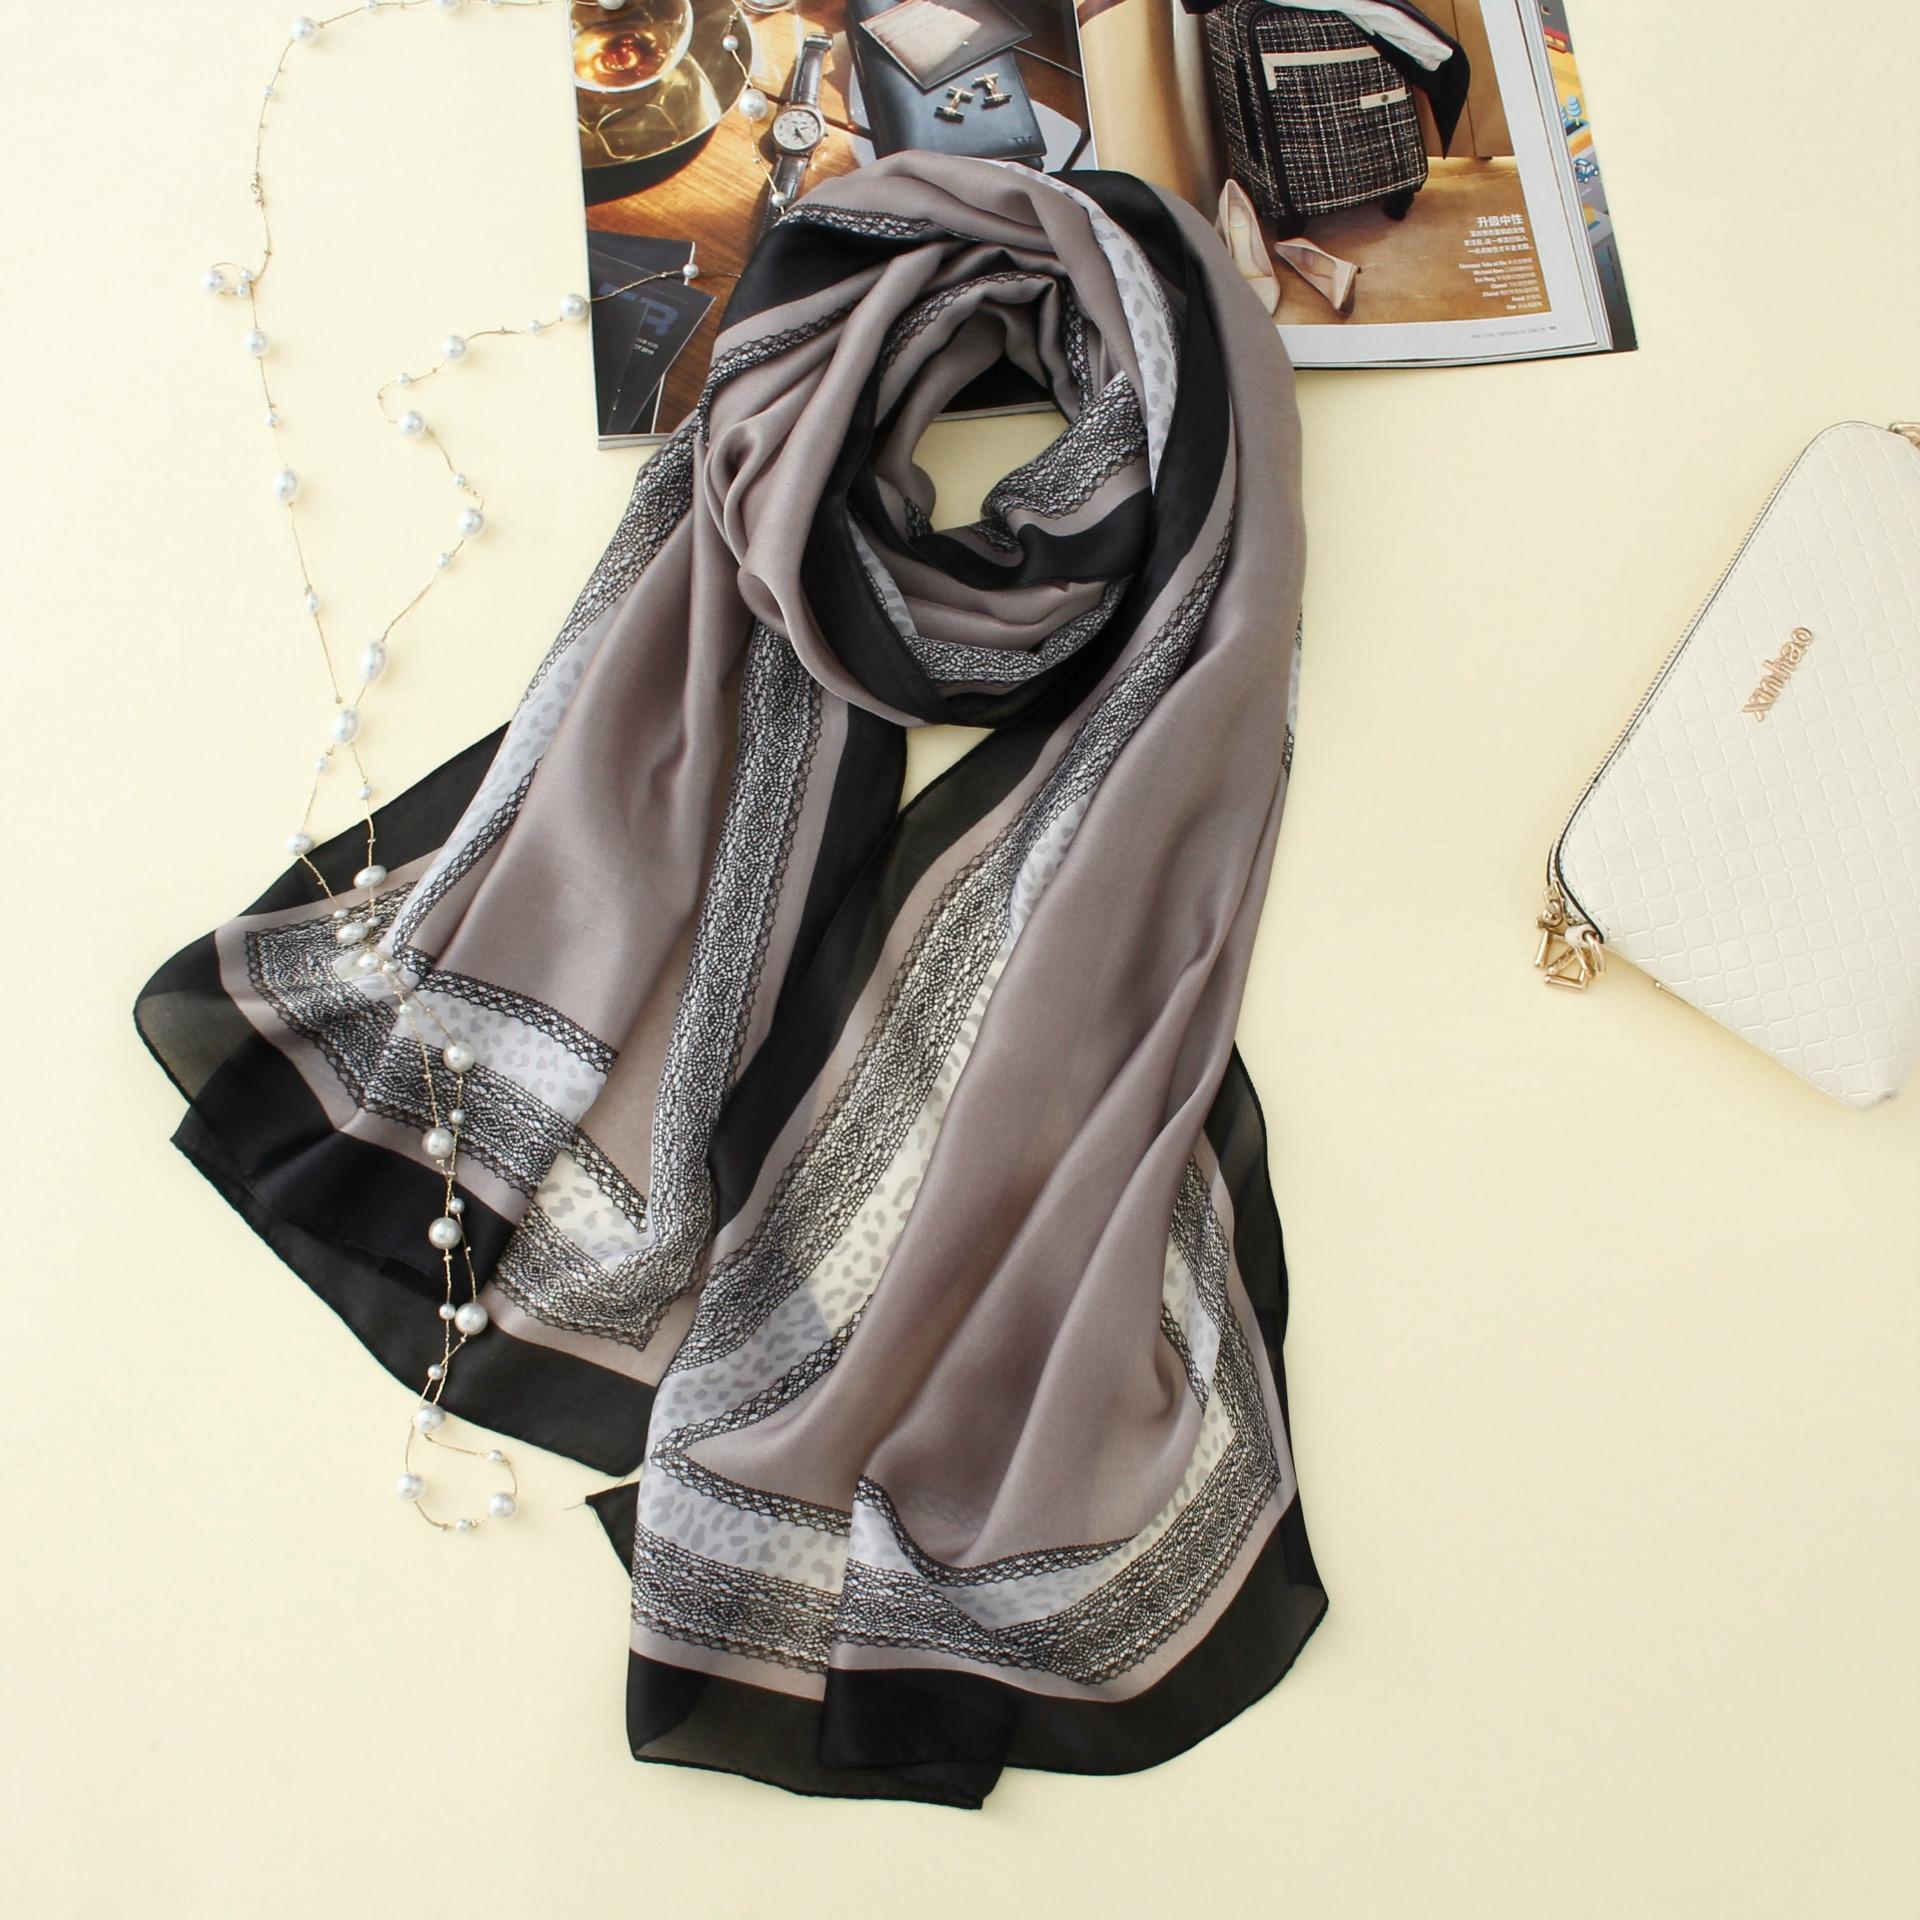 2020 New Brand Women Scarf Fashion Summer Soft Print Long Size Shawls Silk Scarves Lady Pashmina Bandanas 190*80cm